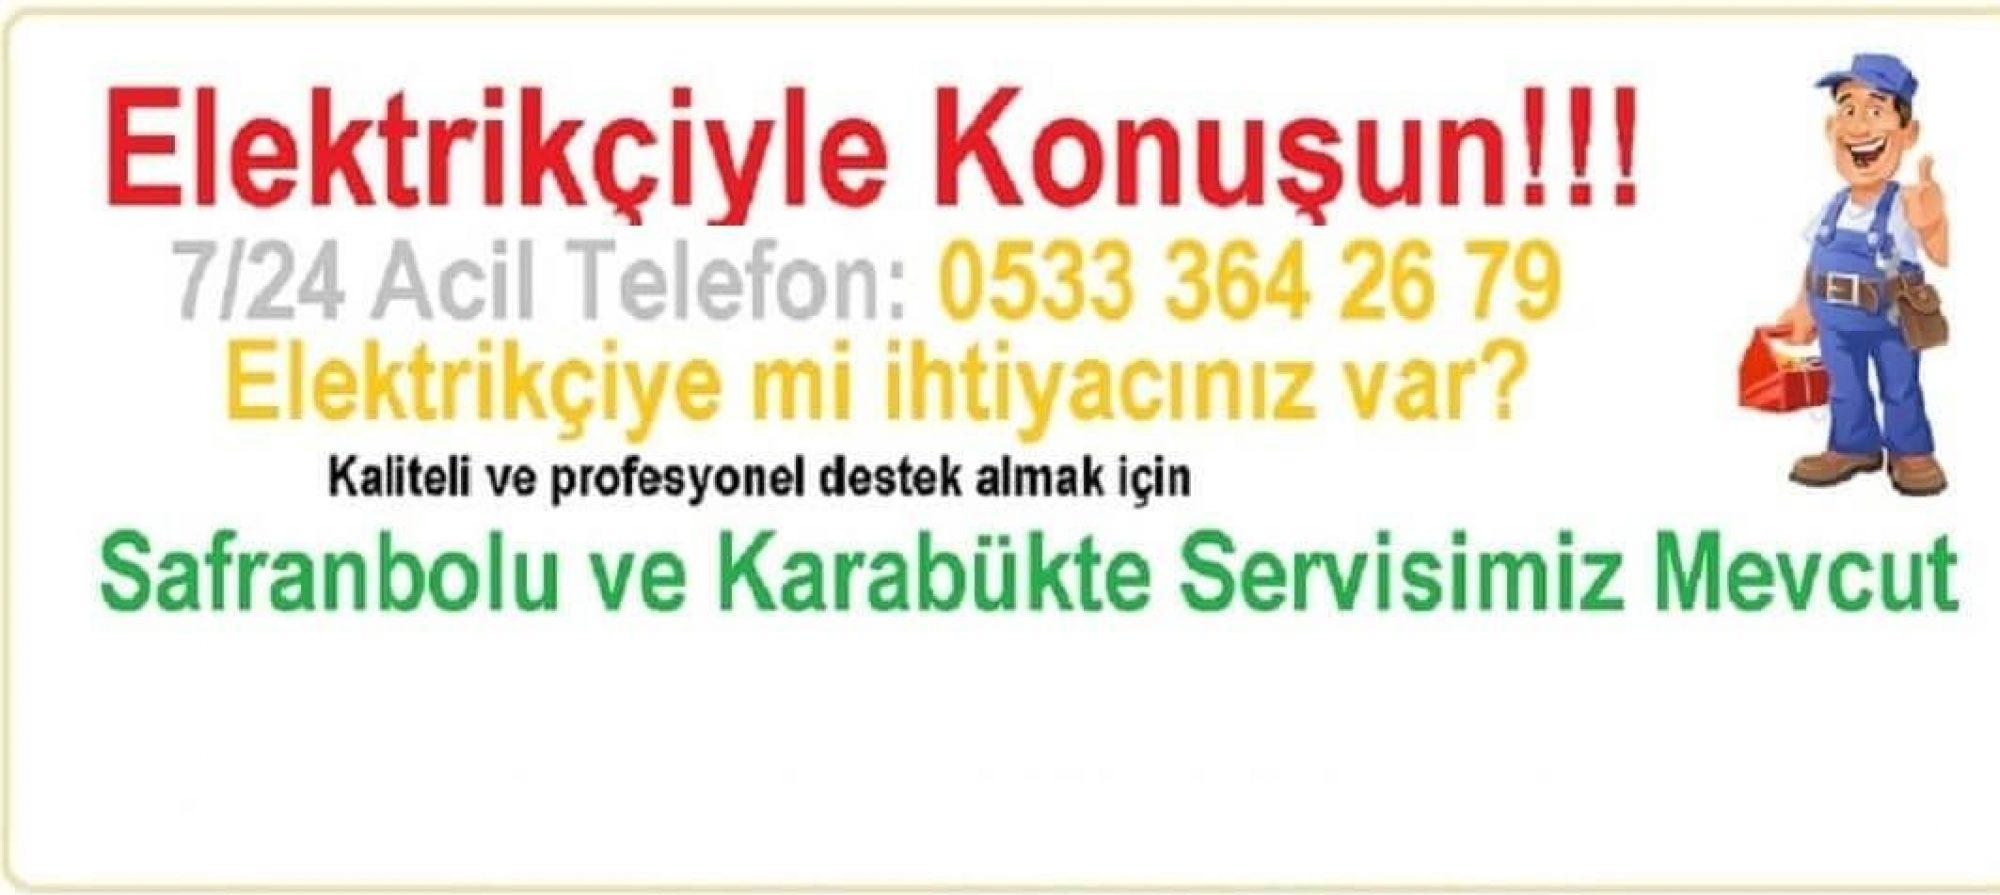 Safranbolu Elektrikçi Şofben Takma